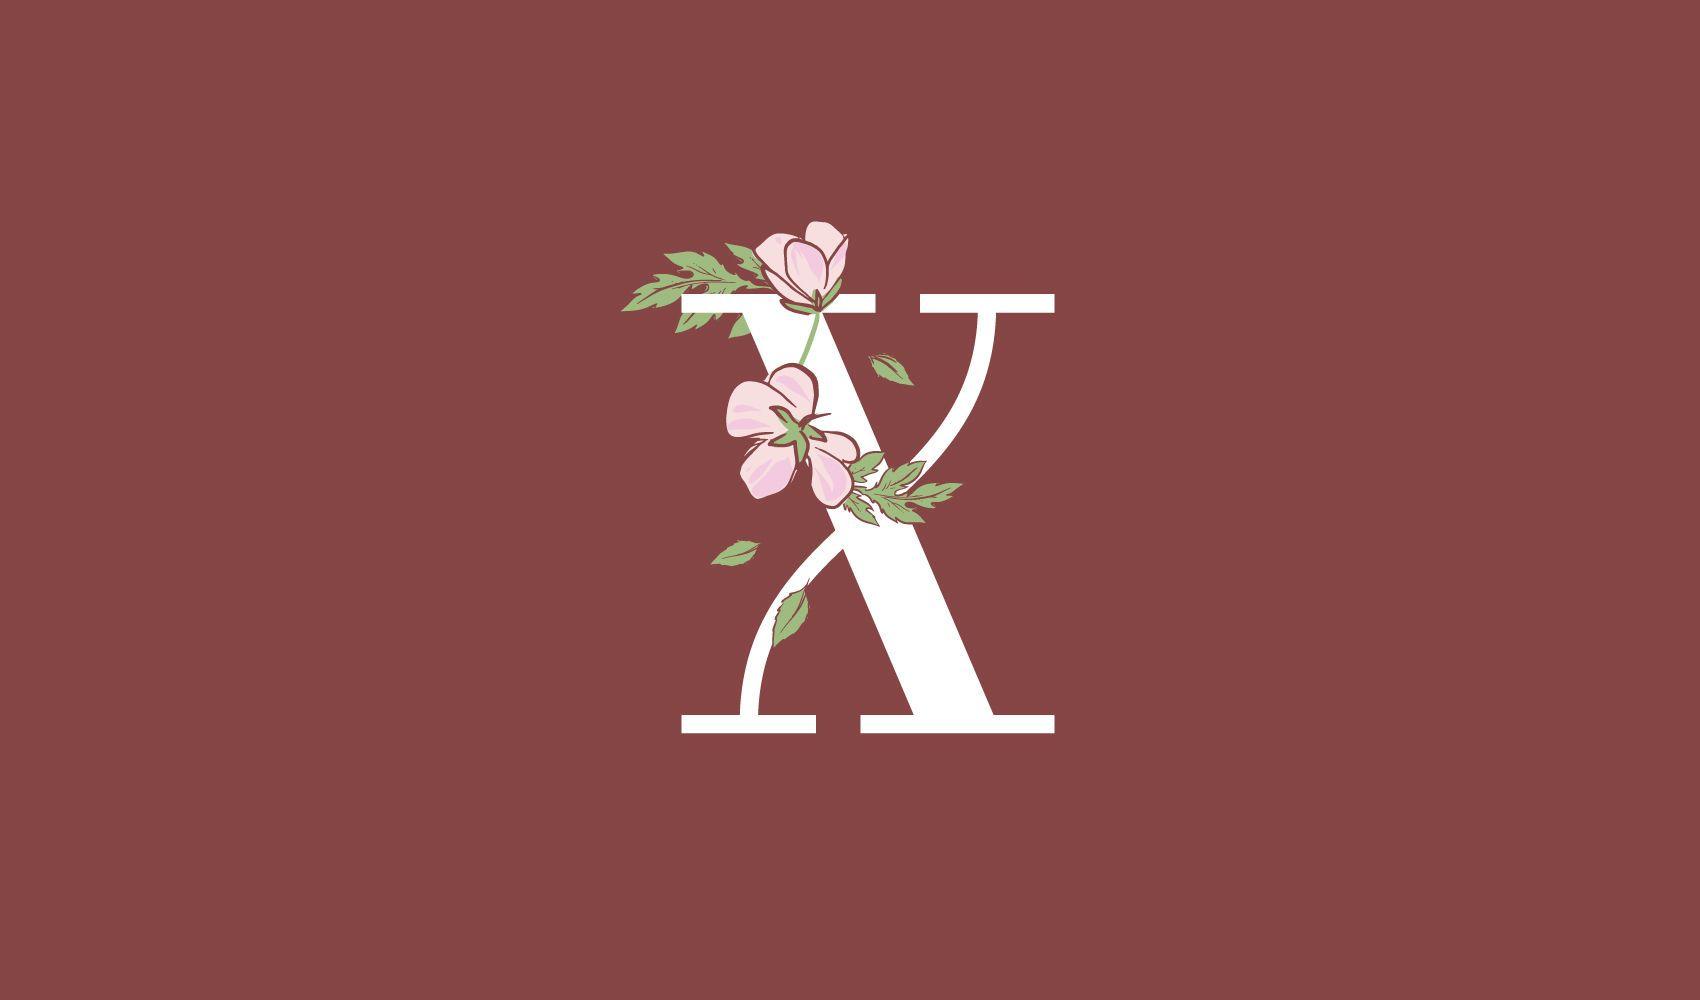 Floral letter x logo template